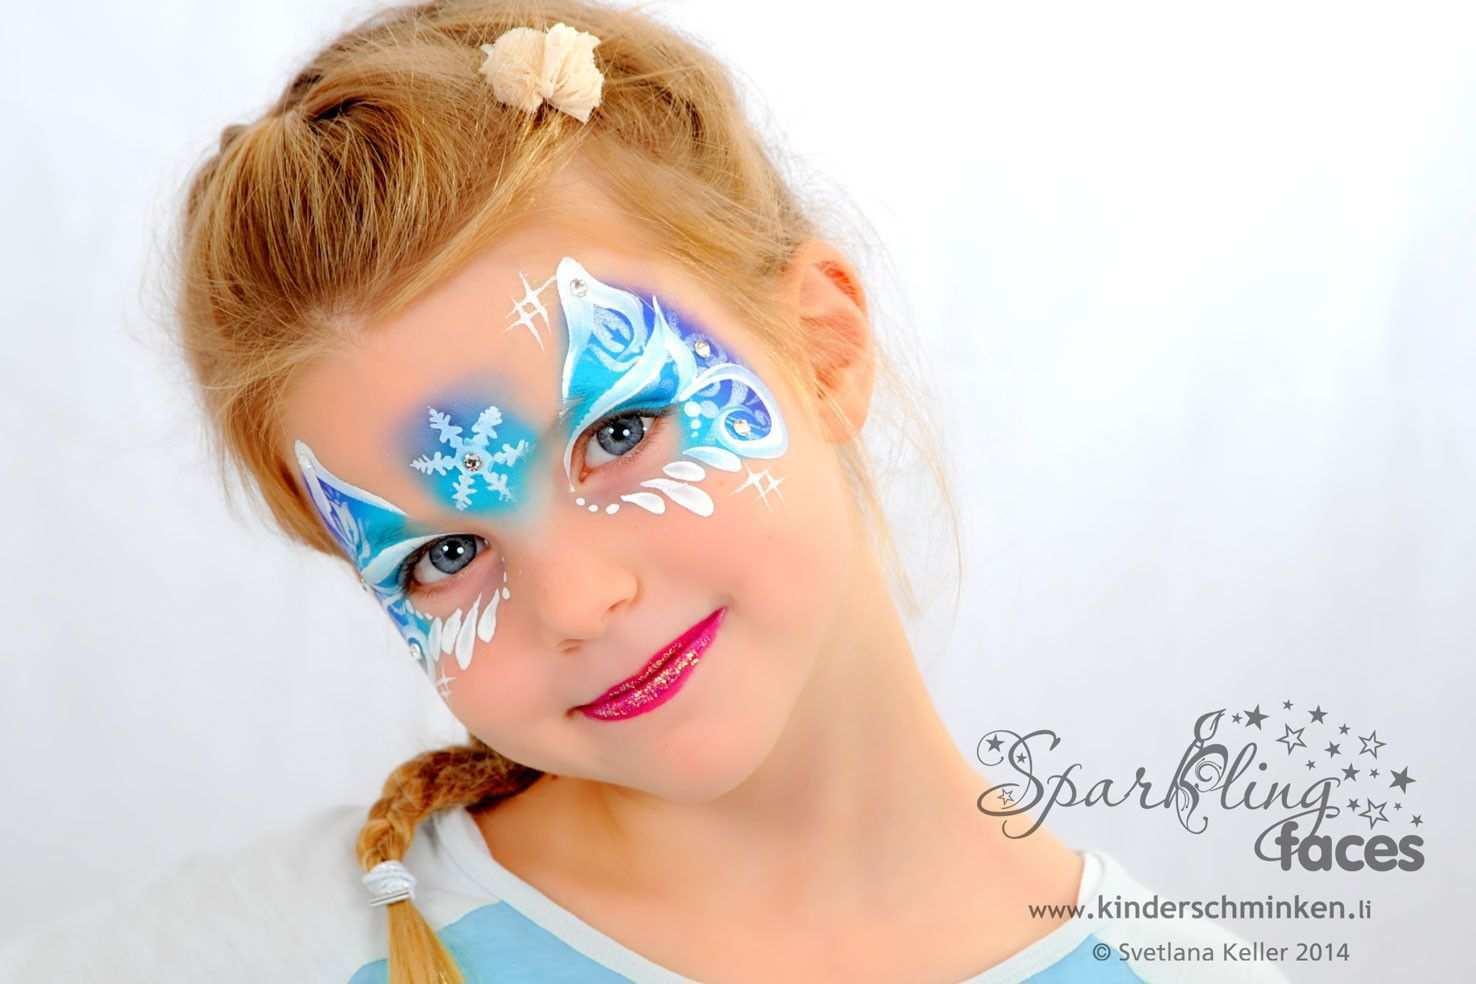 Galerie Sparkling Faces Kinderschminken Farbenverkauf Kurse Kinderschminken Kinder Schminken Bemalte Gesichter